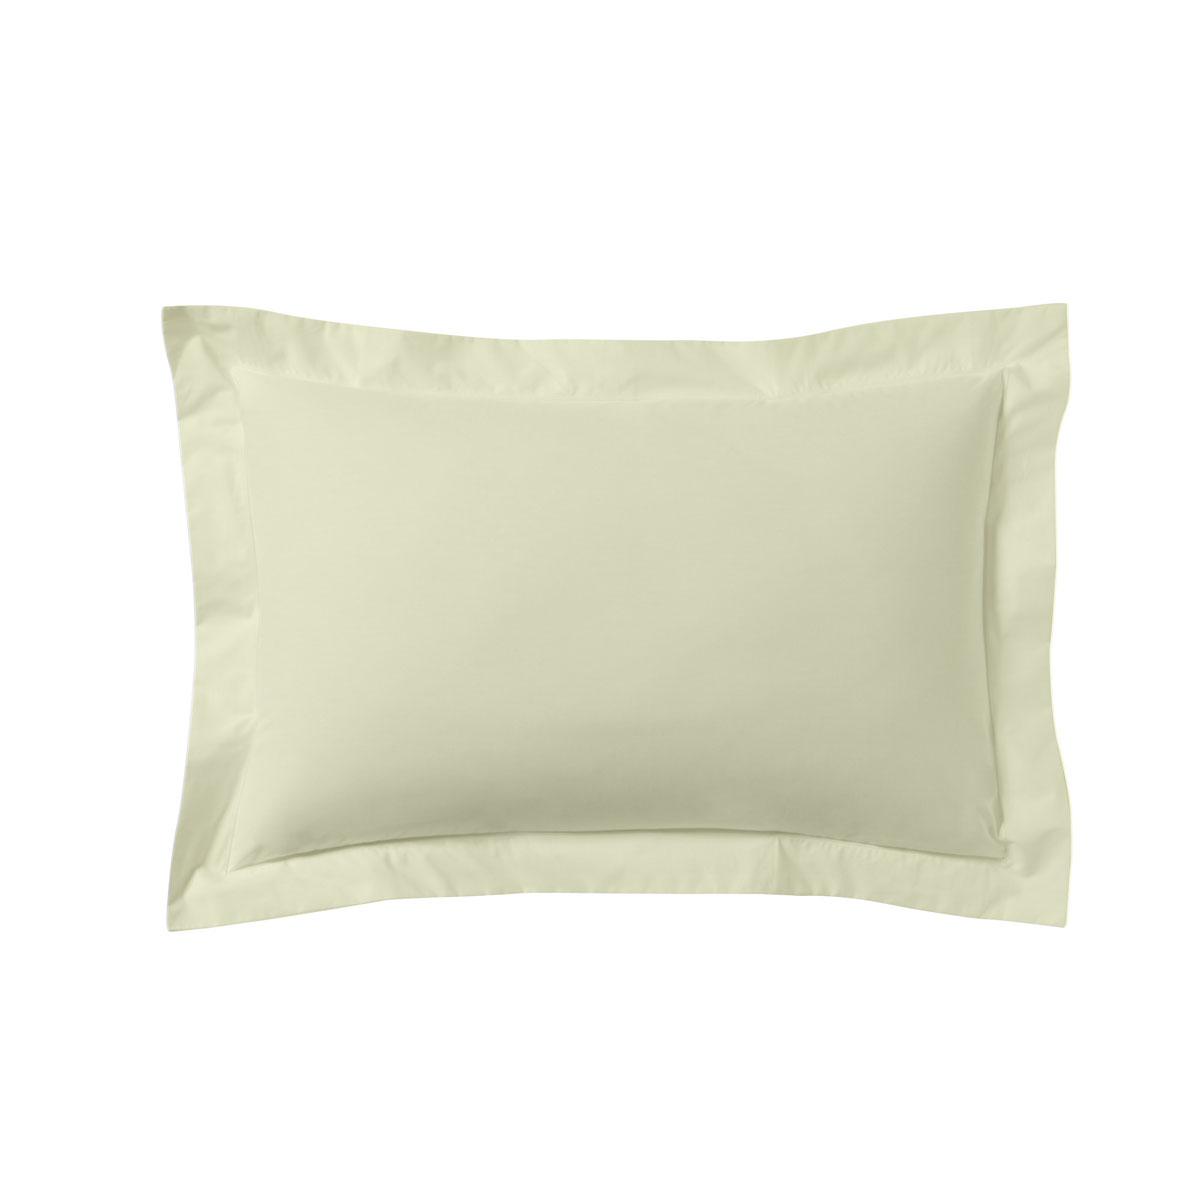 Taie d'oreiller unie en coton lin 50x70